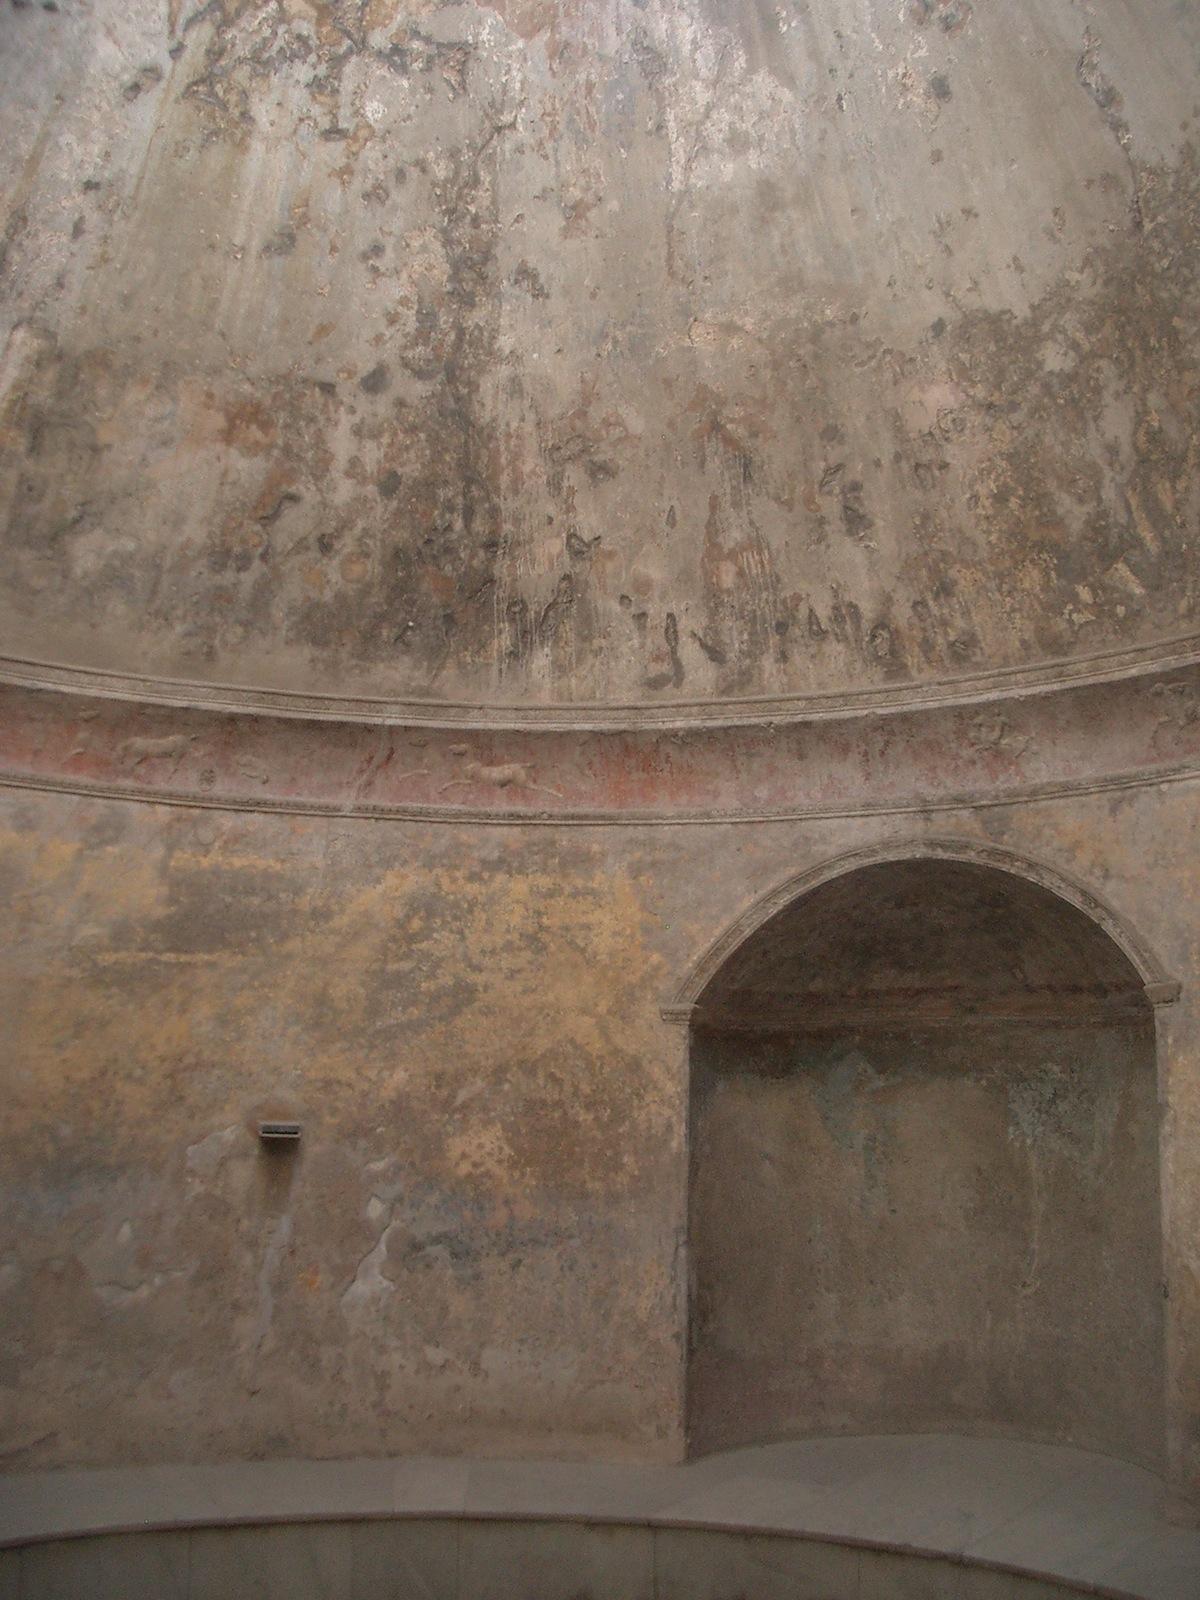 Innenraum mit Kuppel der antike Therme in Pompeji.